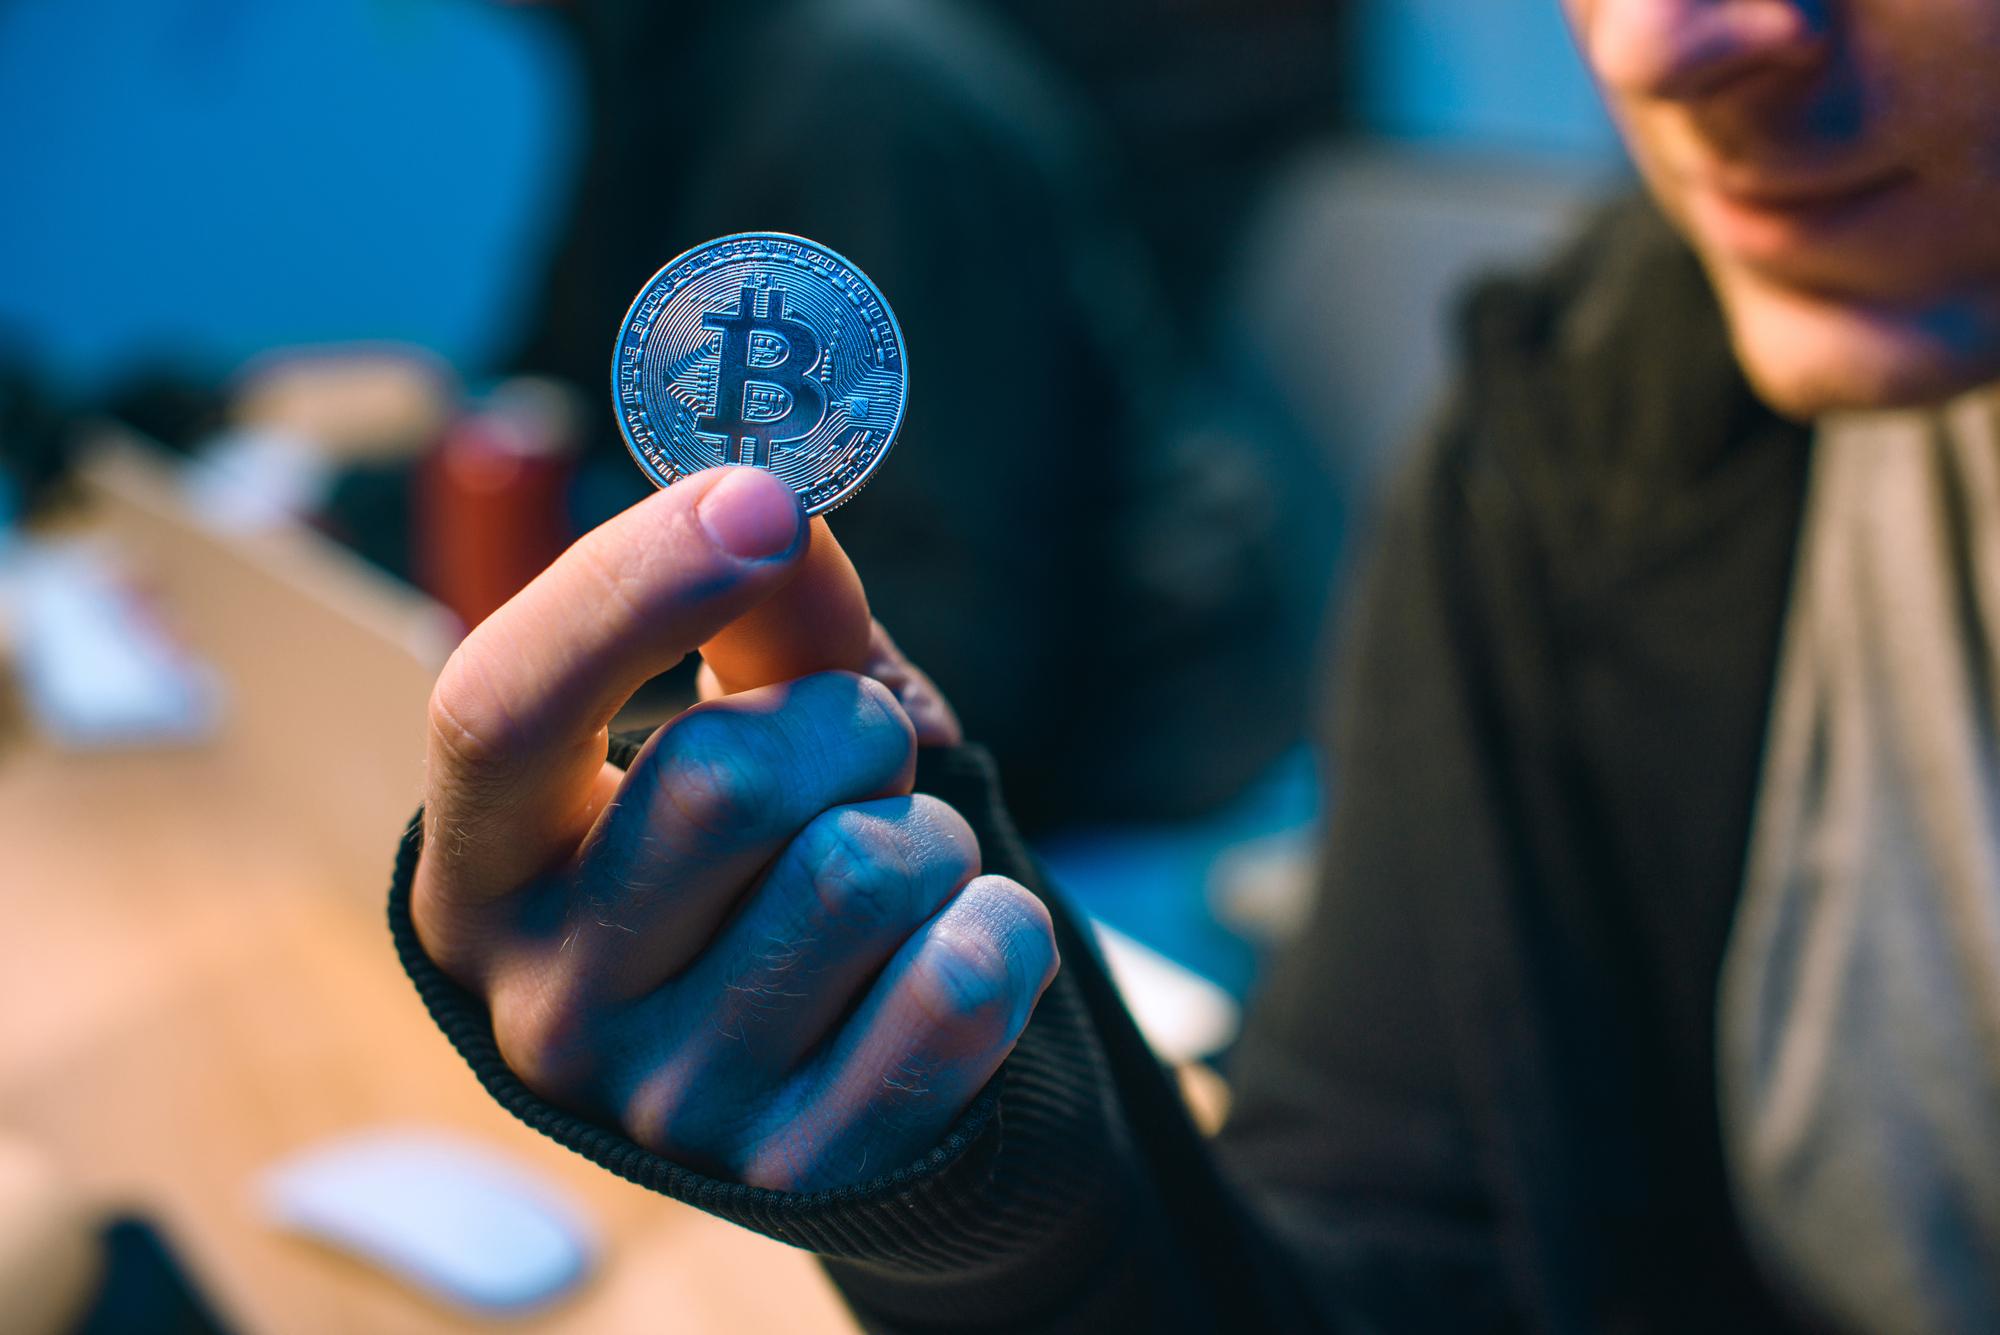 "<p>Фото © <a href=""https://ru.depositphotos.com/190886534/stock-photo-cropped-shot-hacker-holding-bitcoin.html"" target=""_blank"" rel=""noopener noreferrer"">Depositphotos</a></p>"